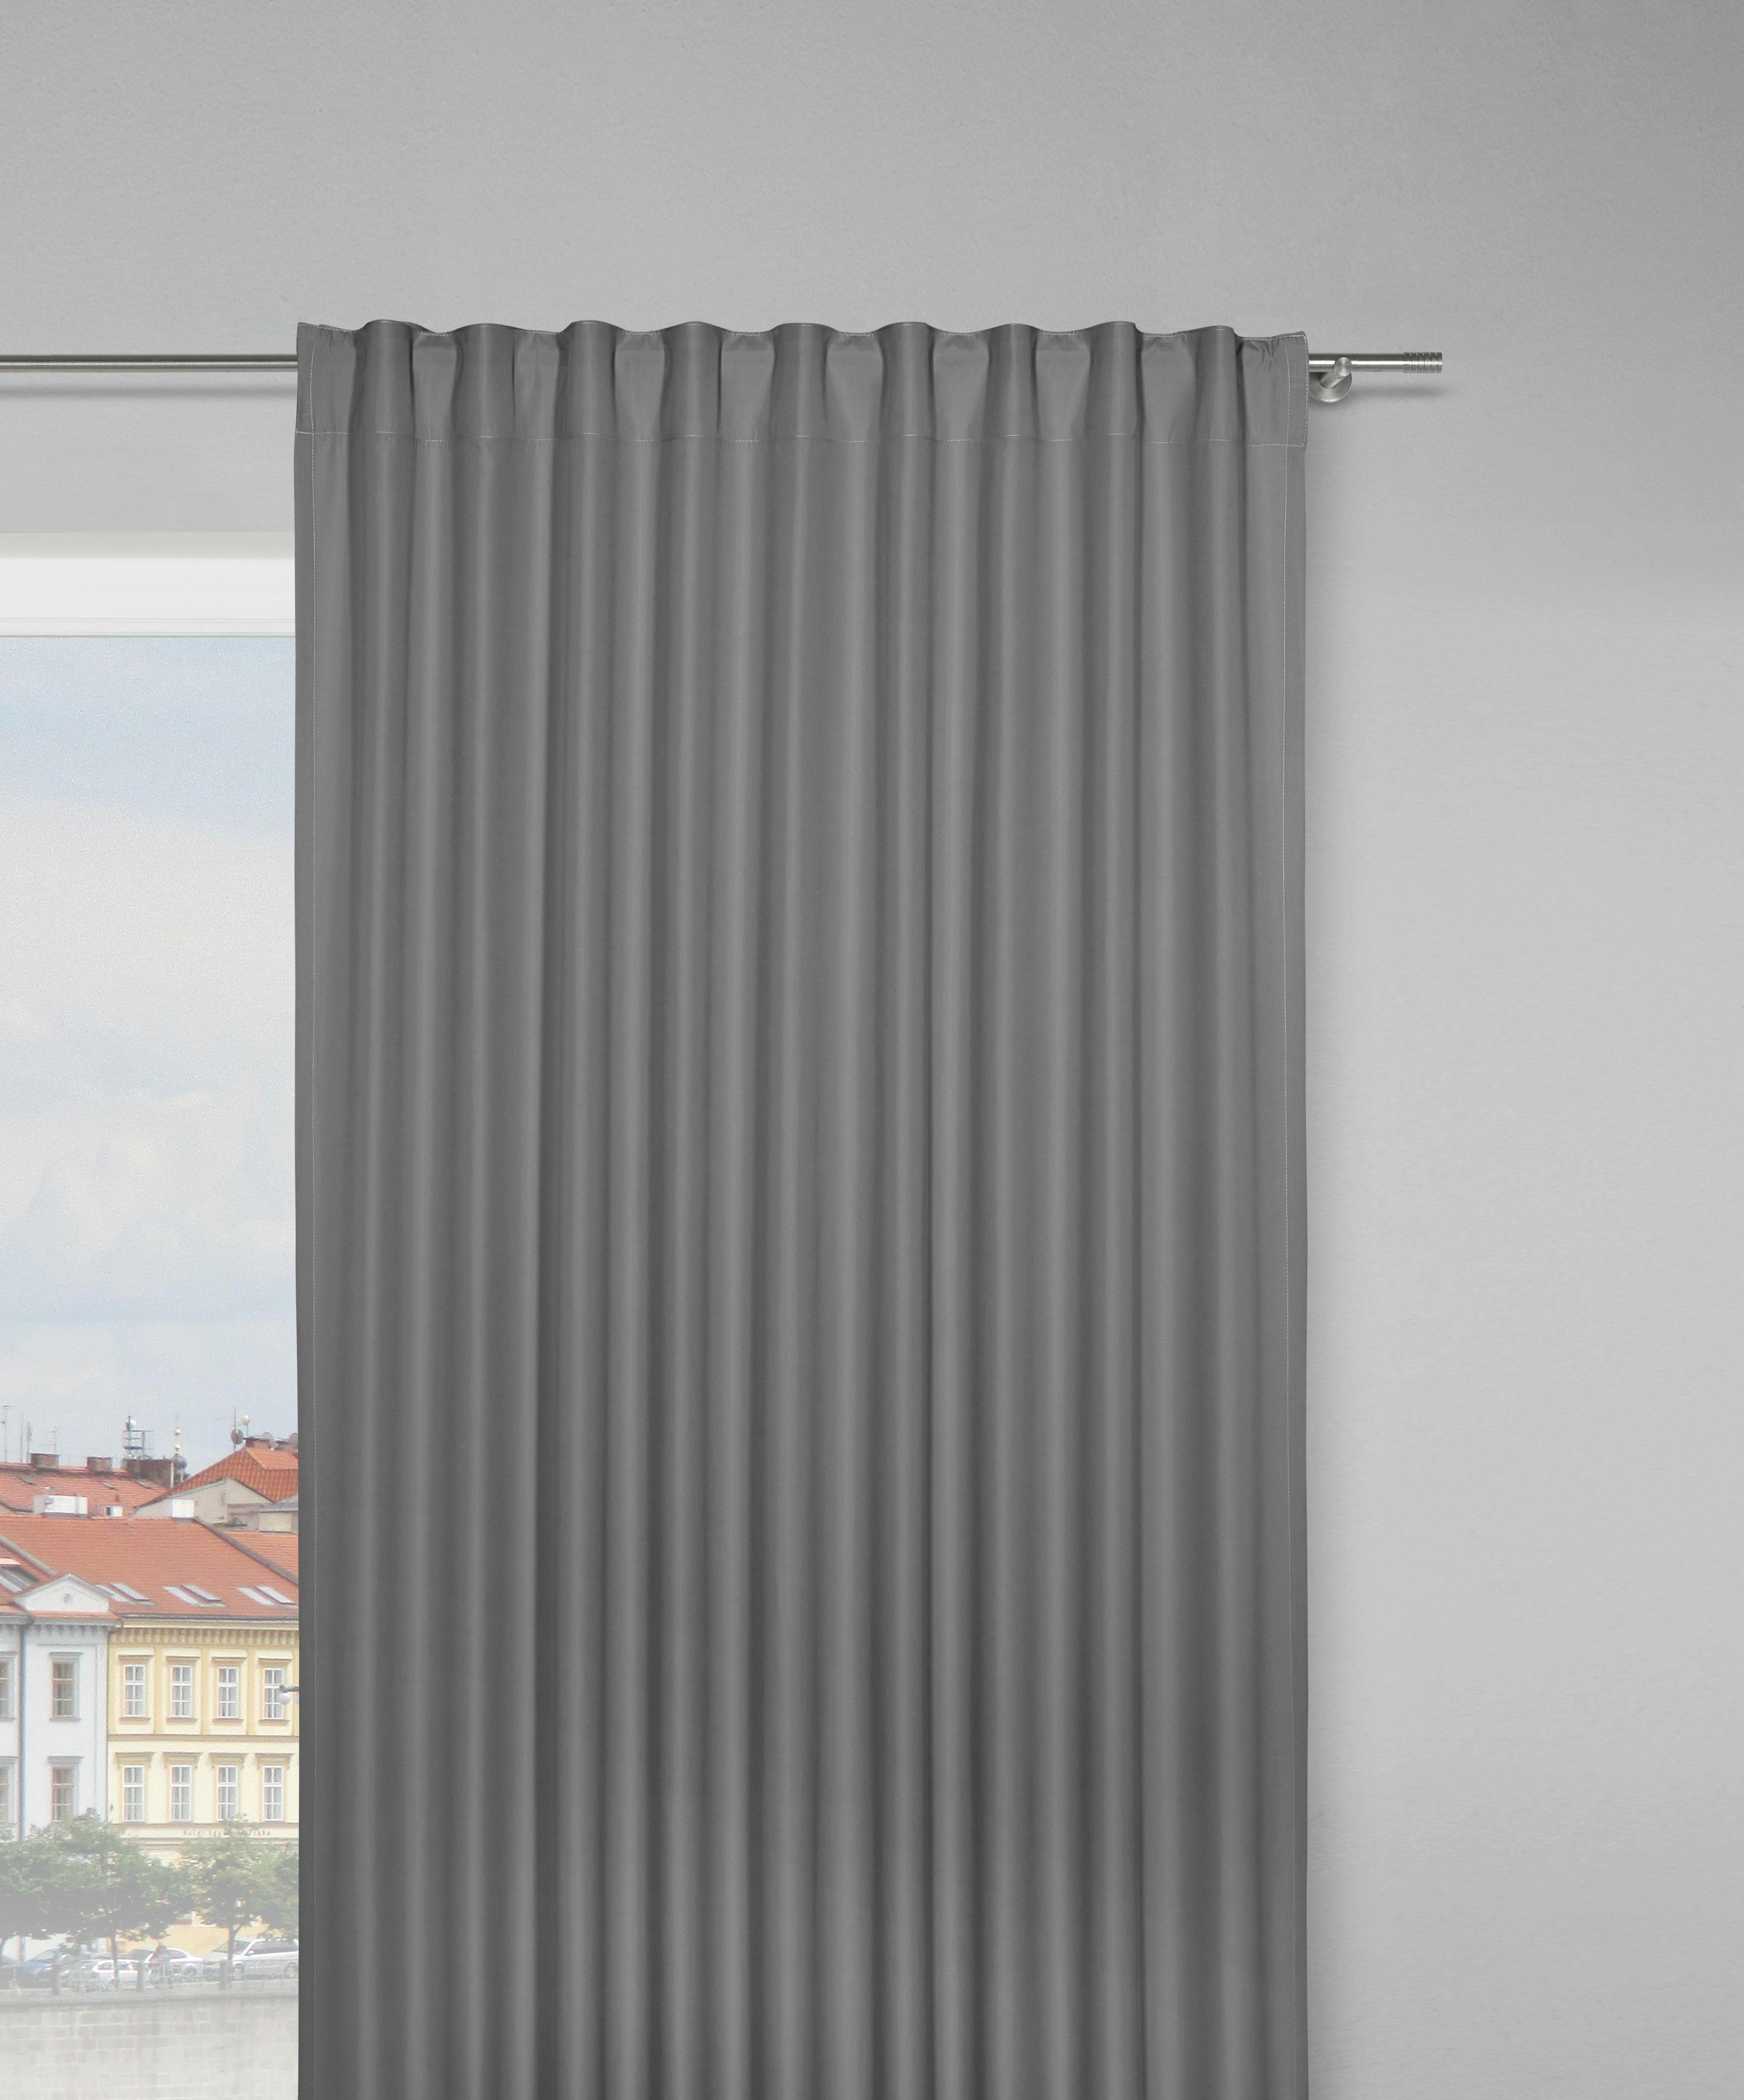 Fertigvorhang Gerd, ca. 140x250cm - Anthrazit, Textil (135/245cm) - MÖMAX modern living